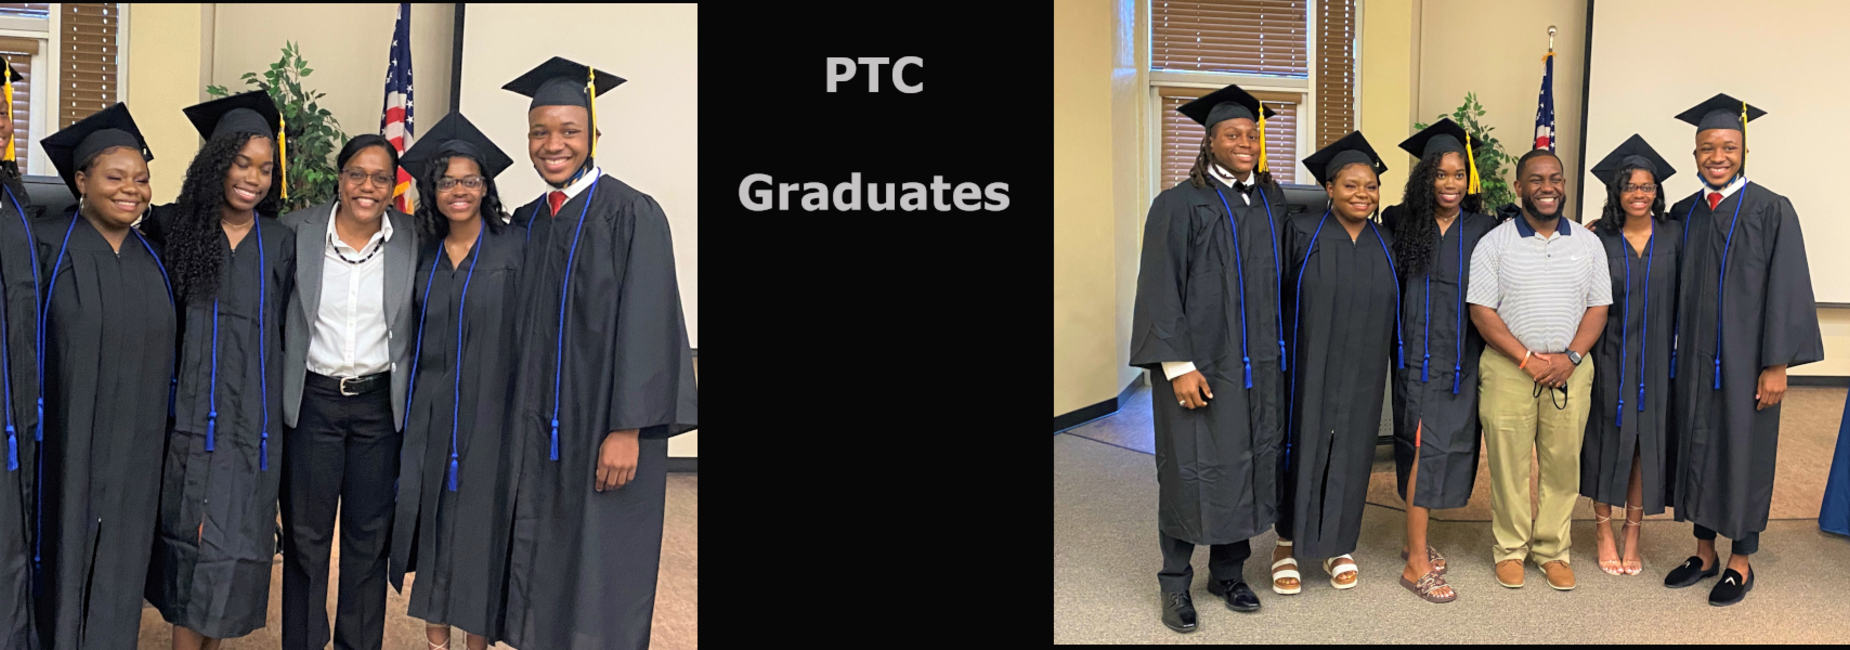 PTC Graduates